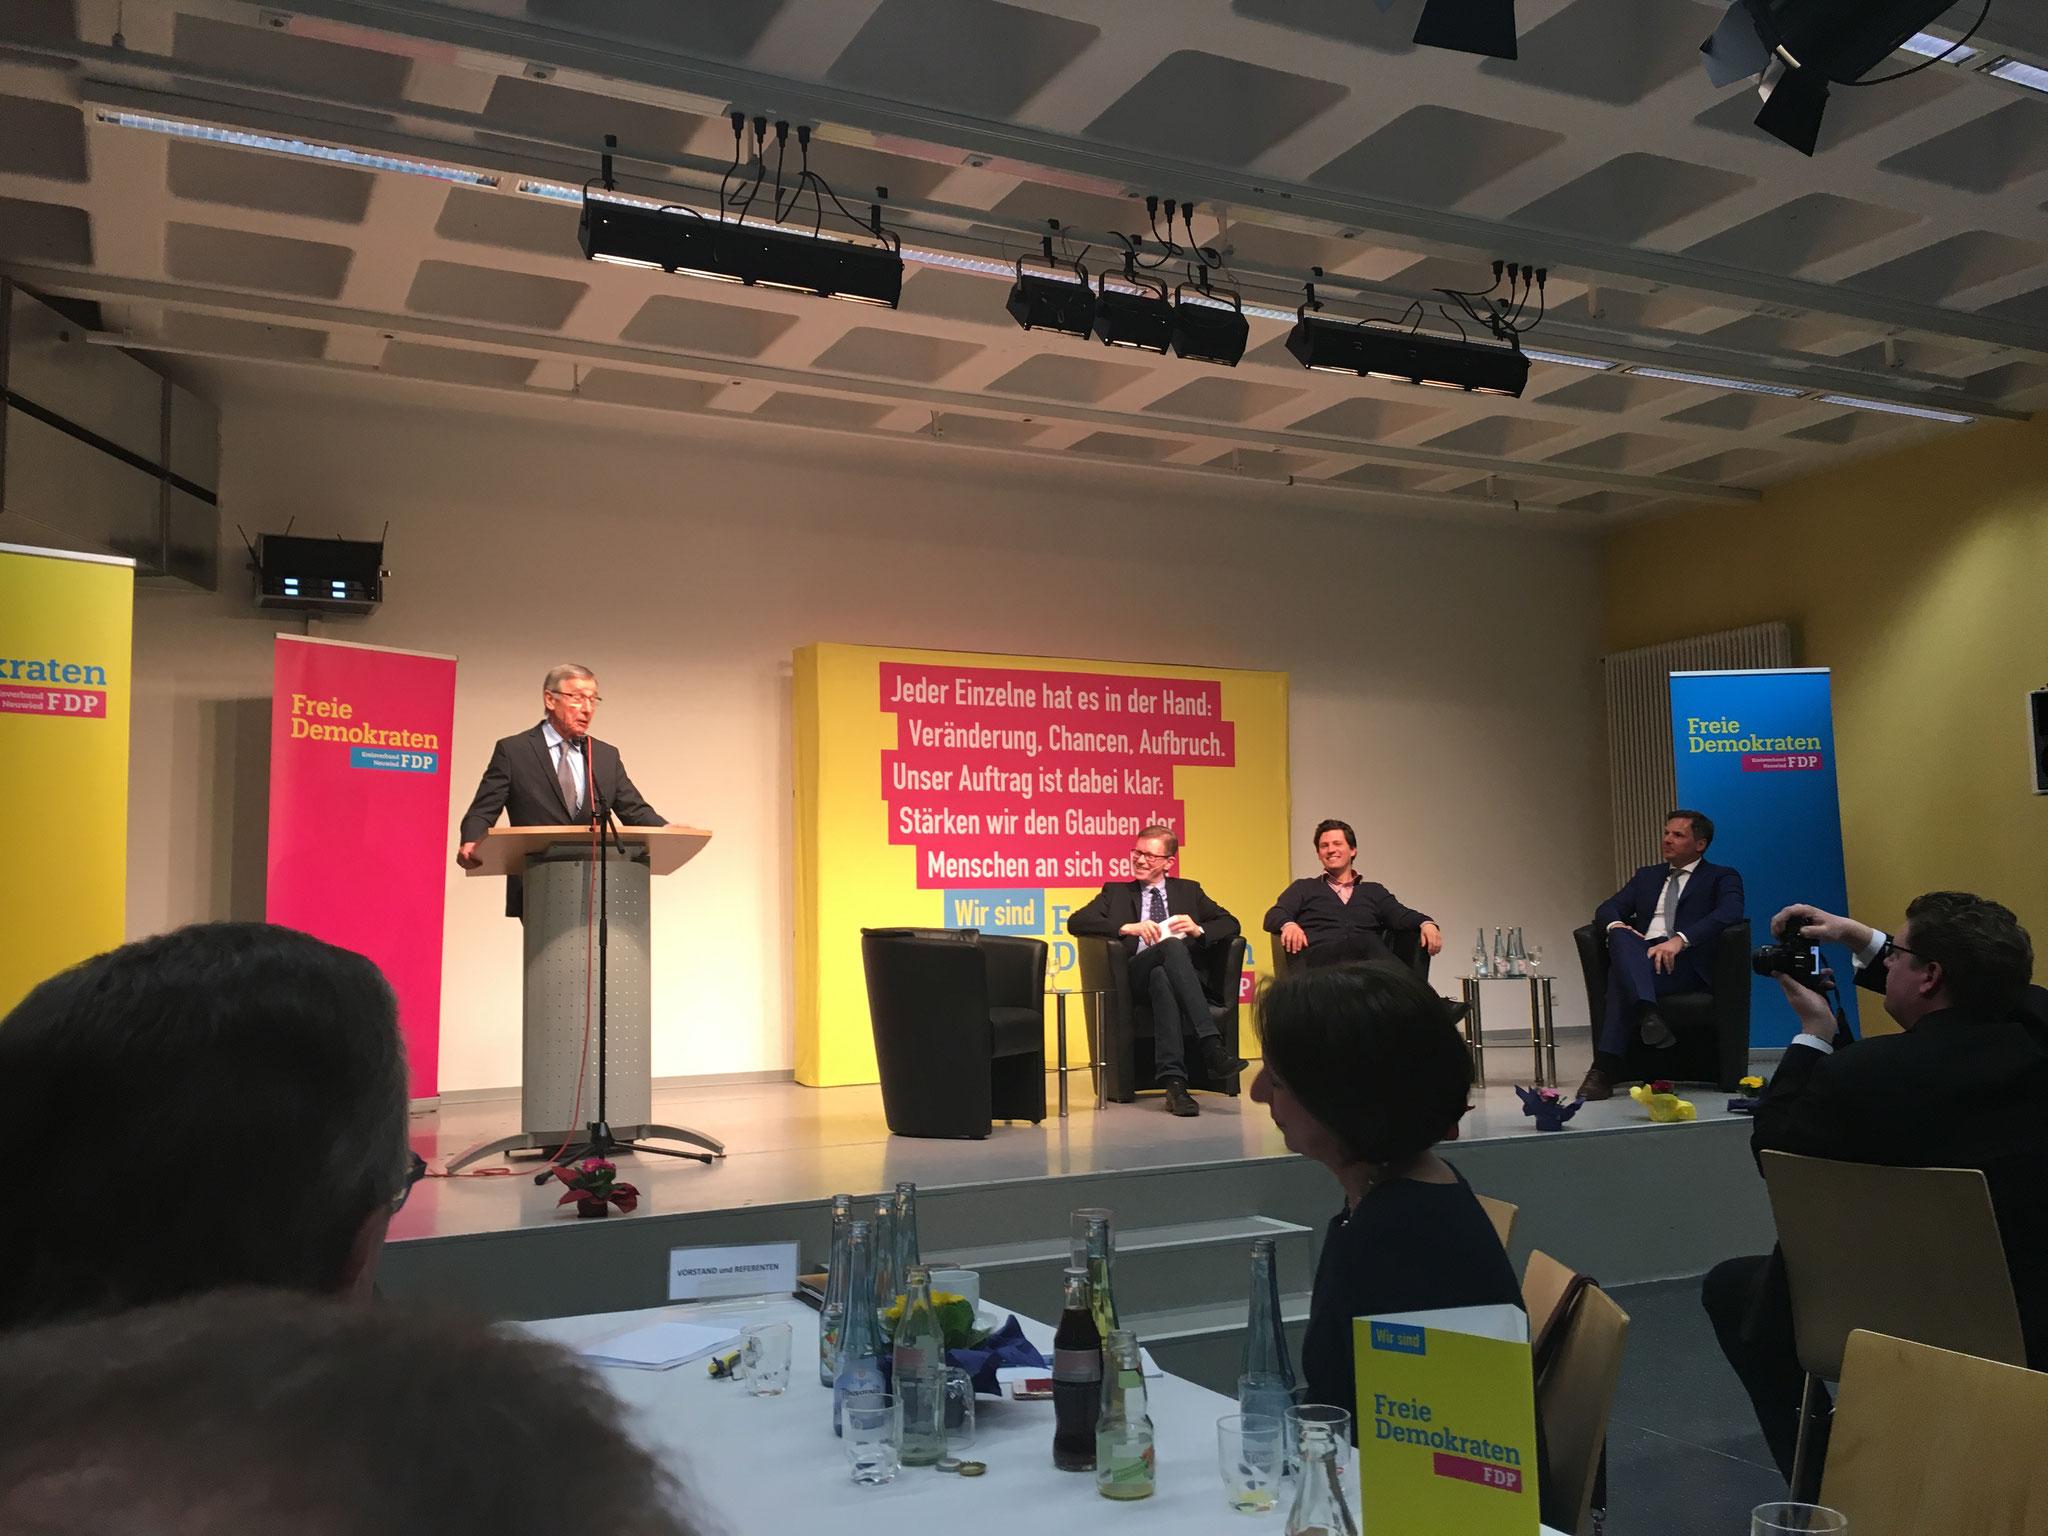 am Rednerpult: Wolfgang Clement (Ministerpräsident NRW a.D.; Bundesminister Wirtschaft und Arbeit a.D.)